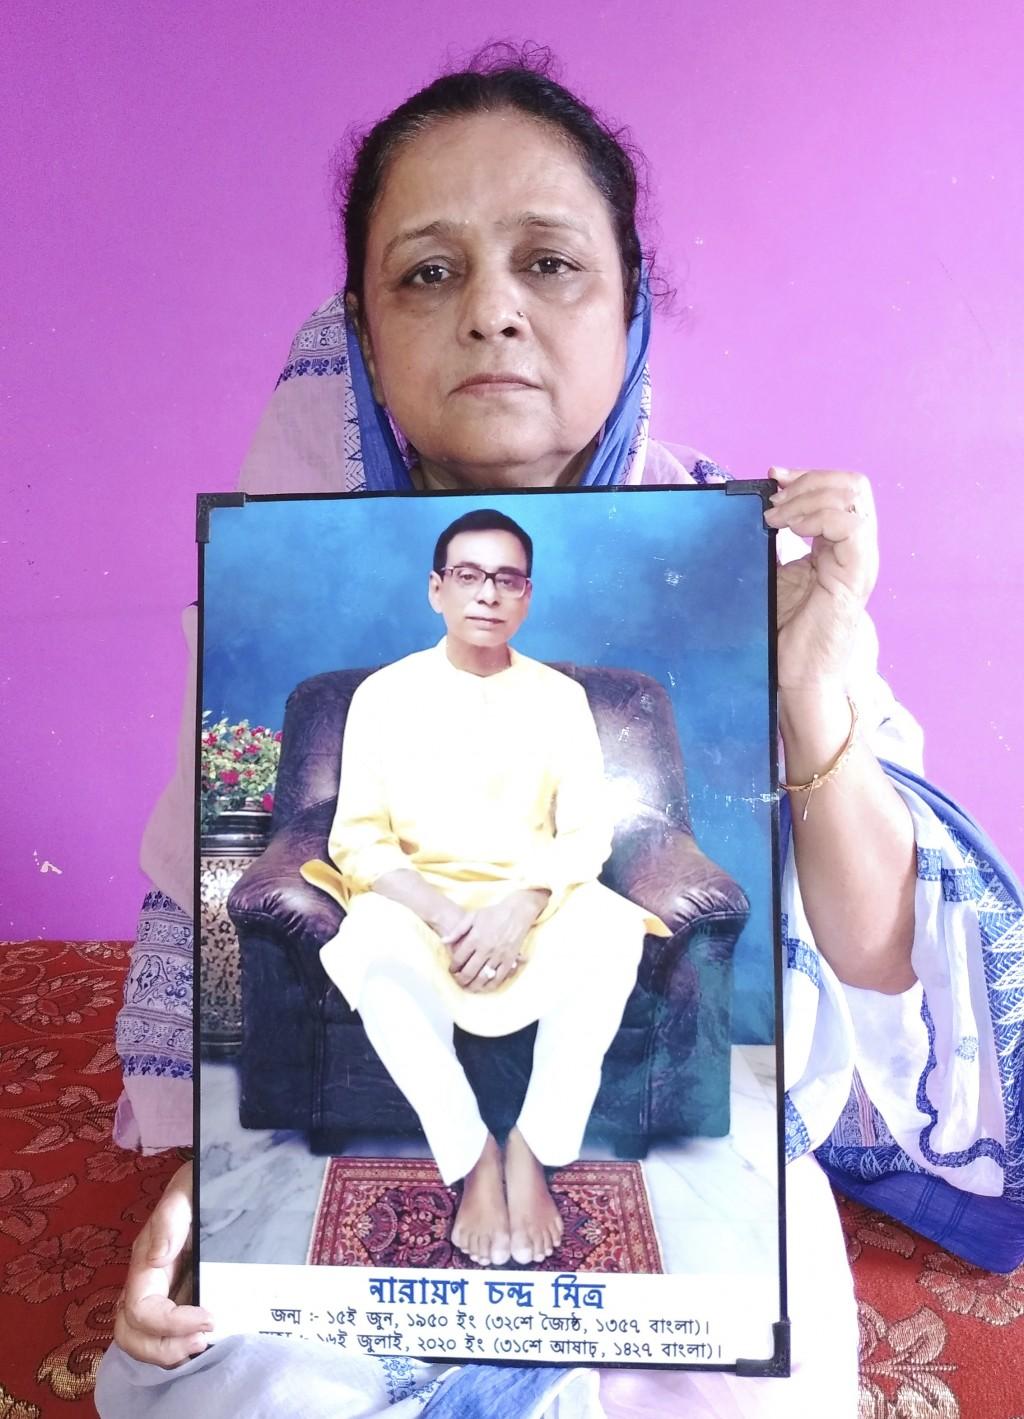 Anindita Mitra, 61, poses with a portrait of her husband late Narayan Mitra, at her house in Silchar, India, Sunday, Sept. 13, 2020. Narayan Mitra, wa...